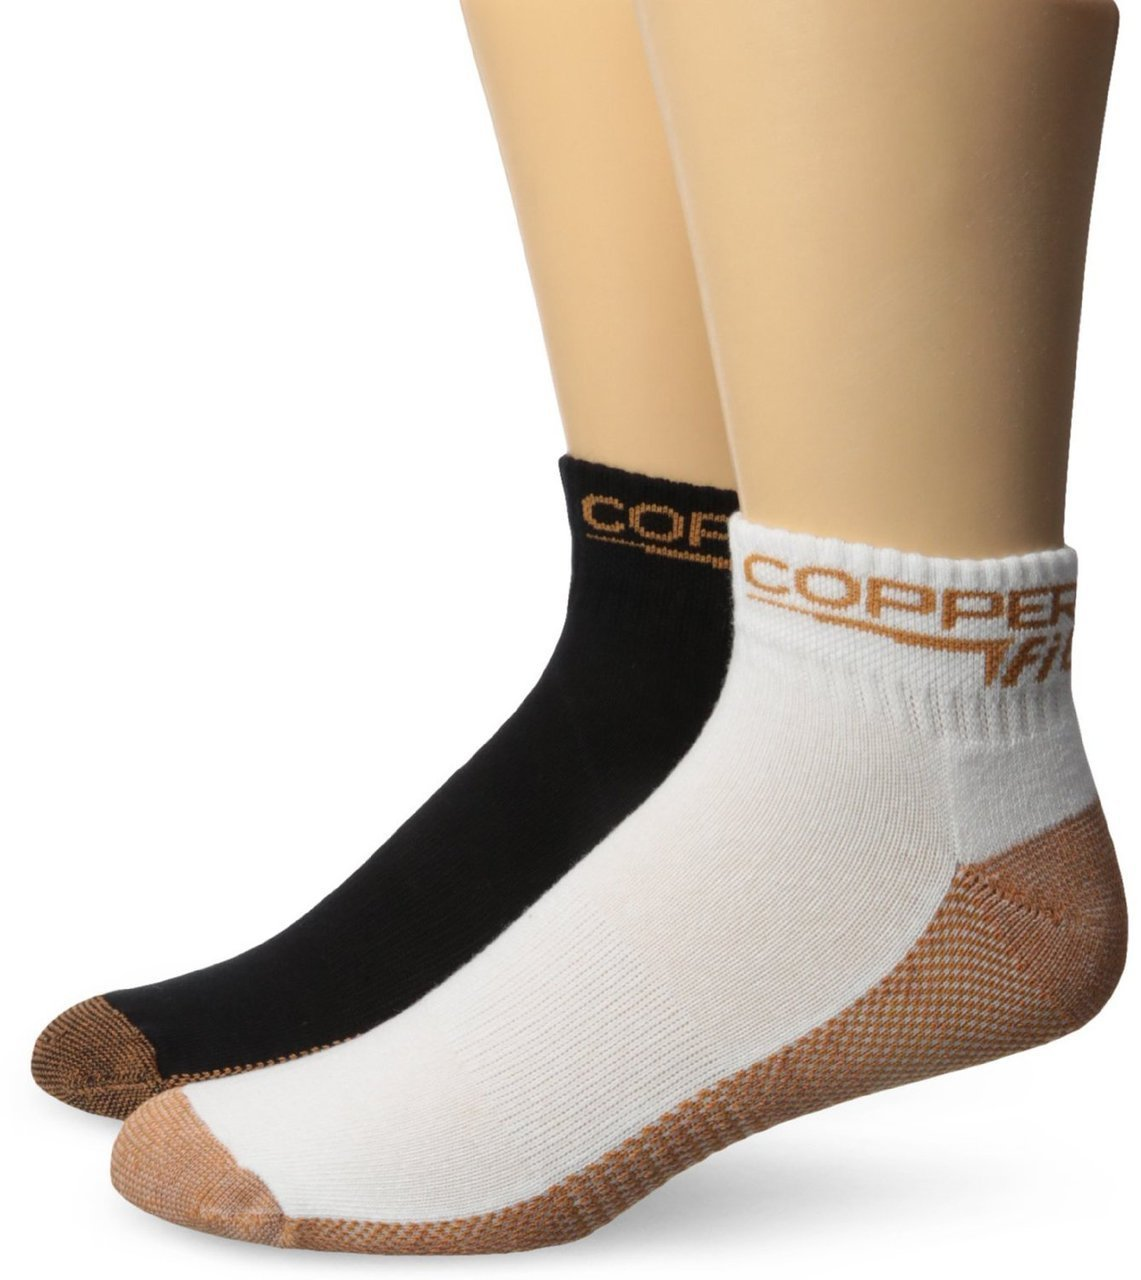 Copper Fit Ankle Socks (2 Pair), Black/White, Small/Medium